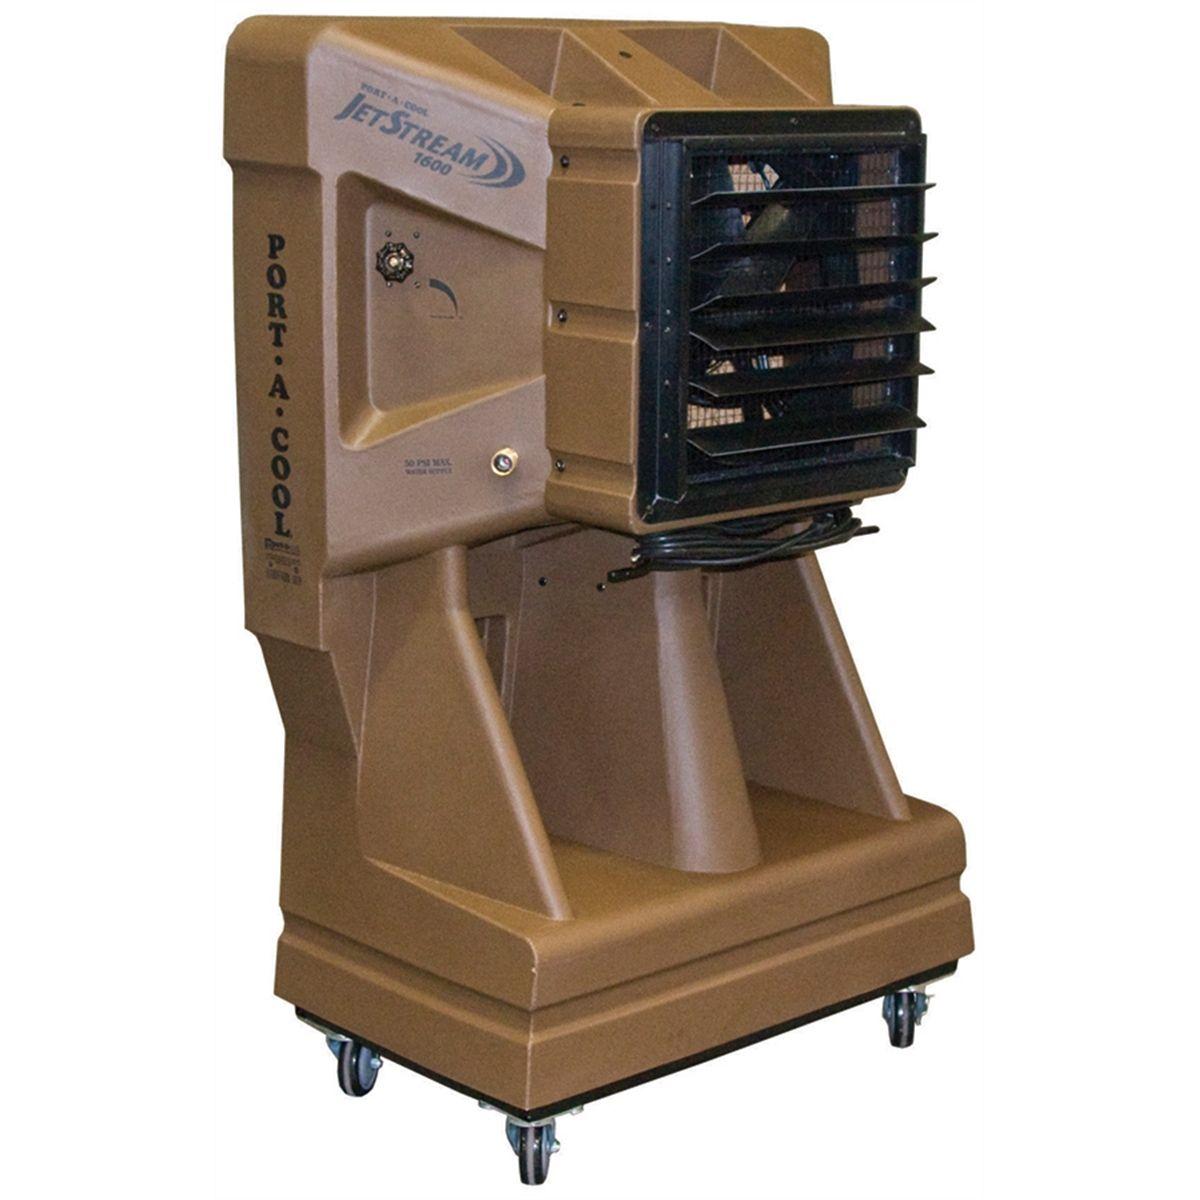 Jetstream 1600 Portable Evaporative Cooler Port A Cool